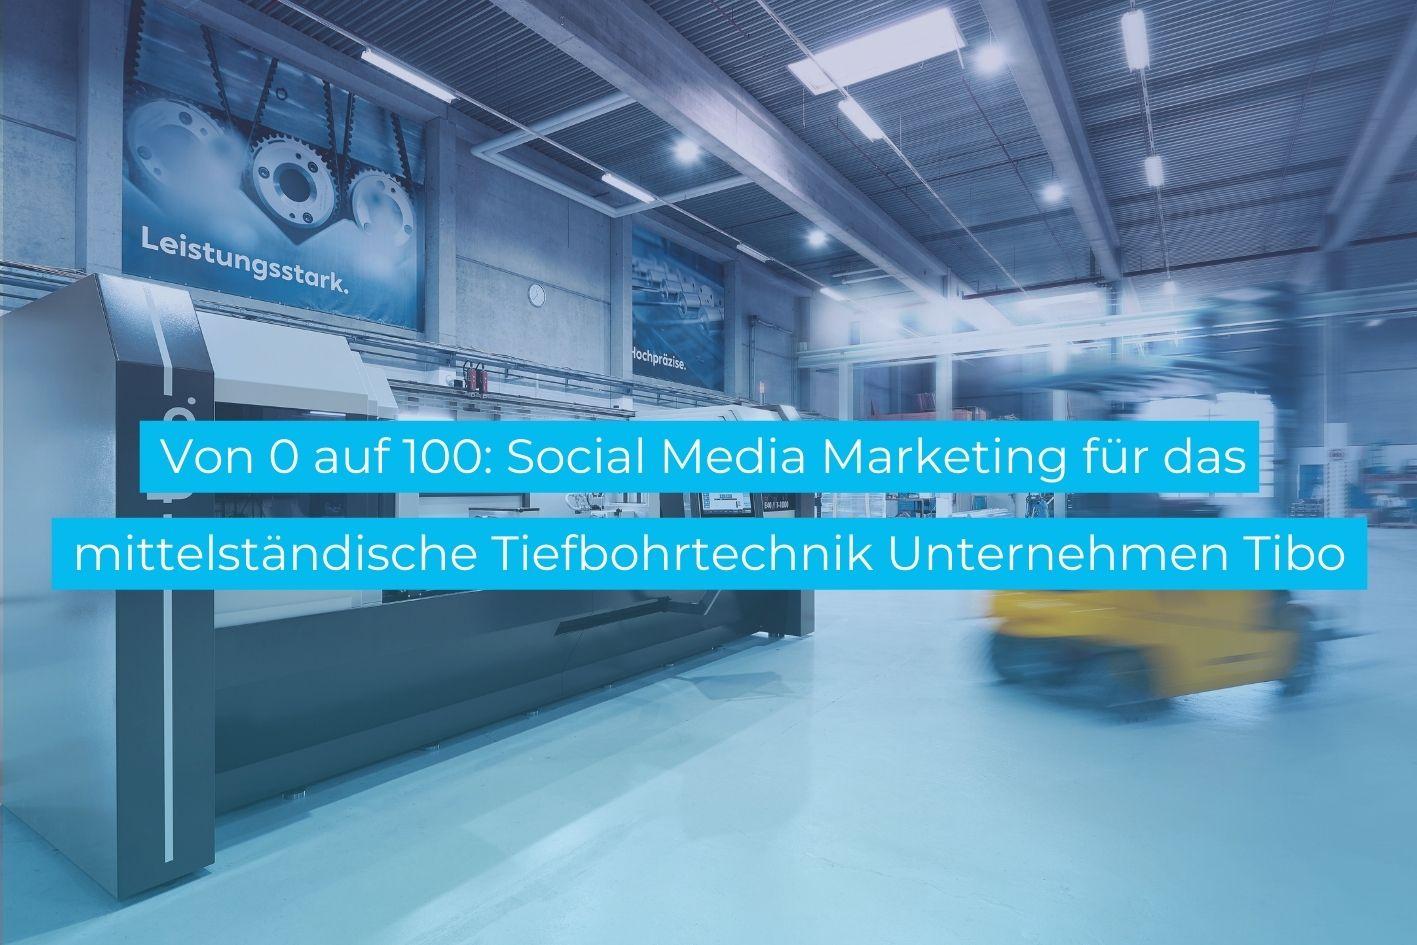 Social Media Marketing Tibo